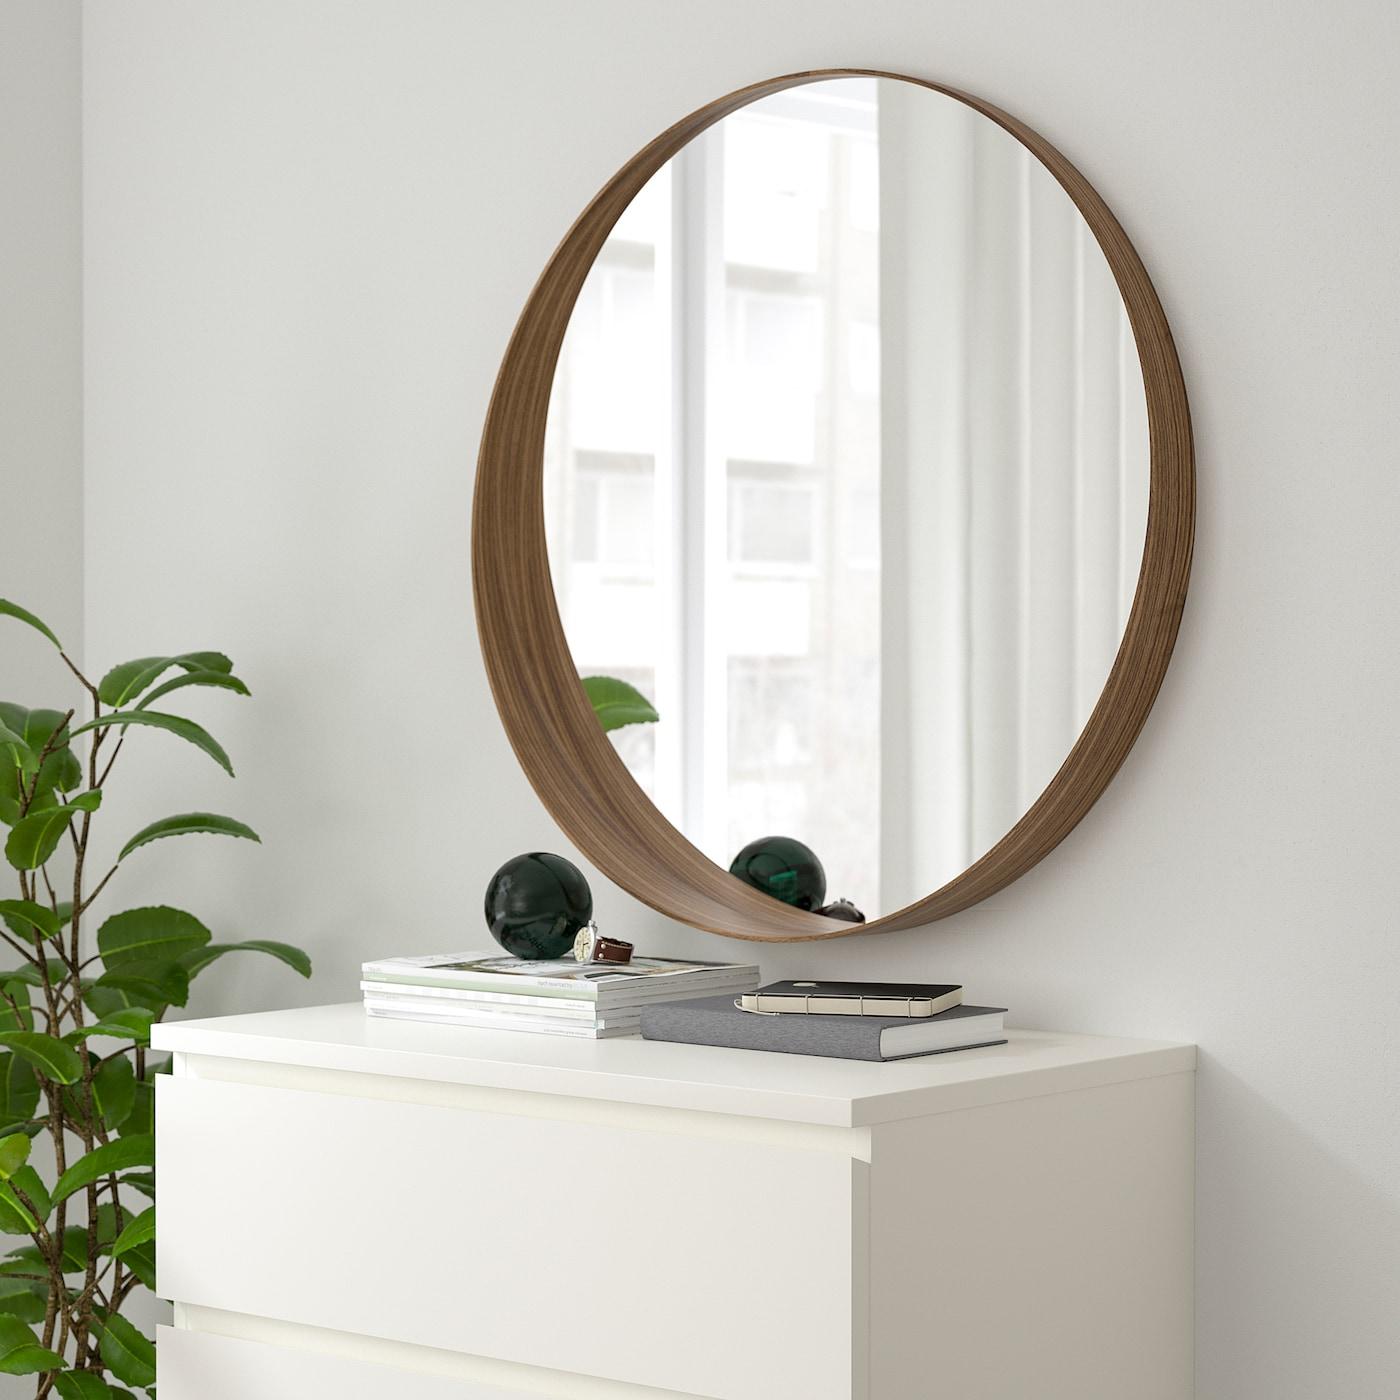 Stockholm Specchio Impiallacciatura Di Noce 80 Cm Ikea It